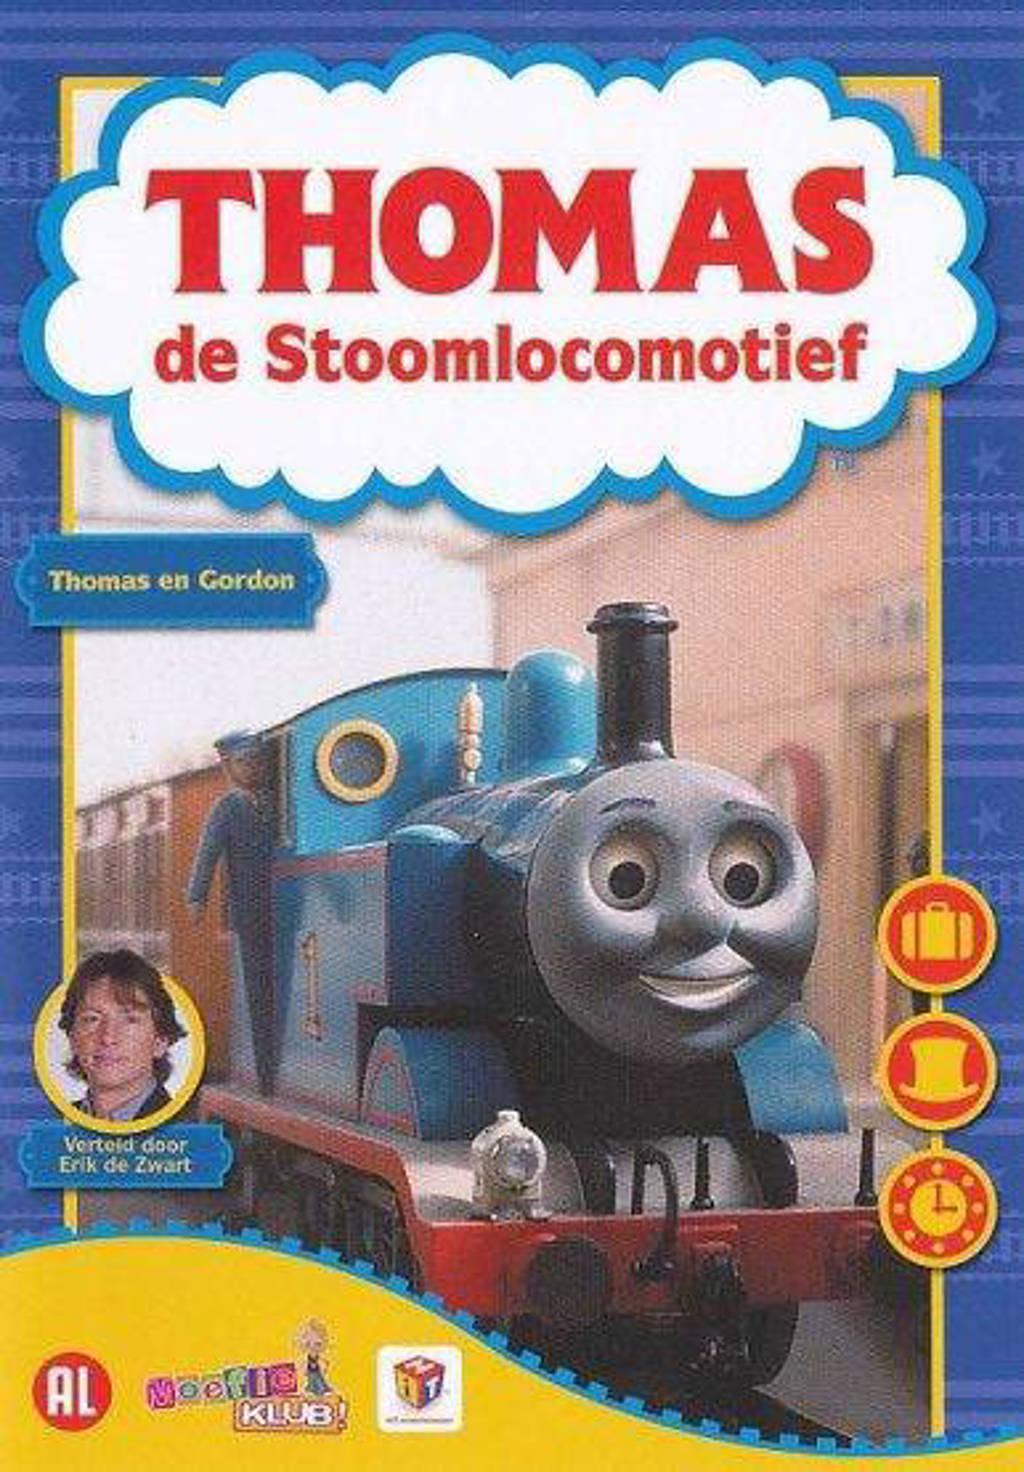 Thomas de stoomlocomotief - Thomas & Gordon (DVD)